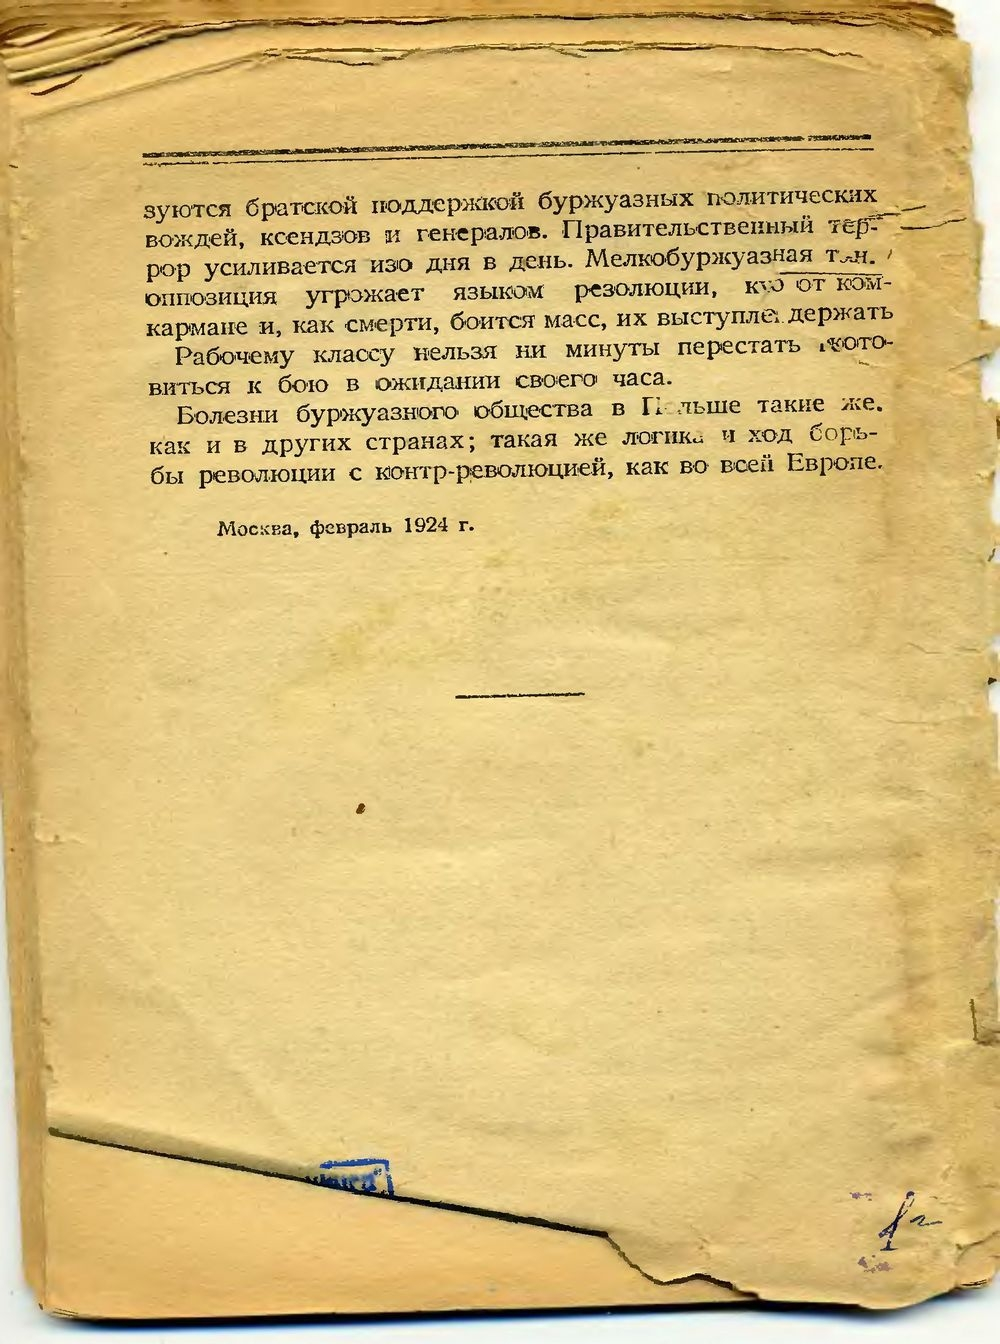 http://i5.imageban.ru/out/2014/01/20/b94b69a5862efb8000594731a6f2337f.jpg